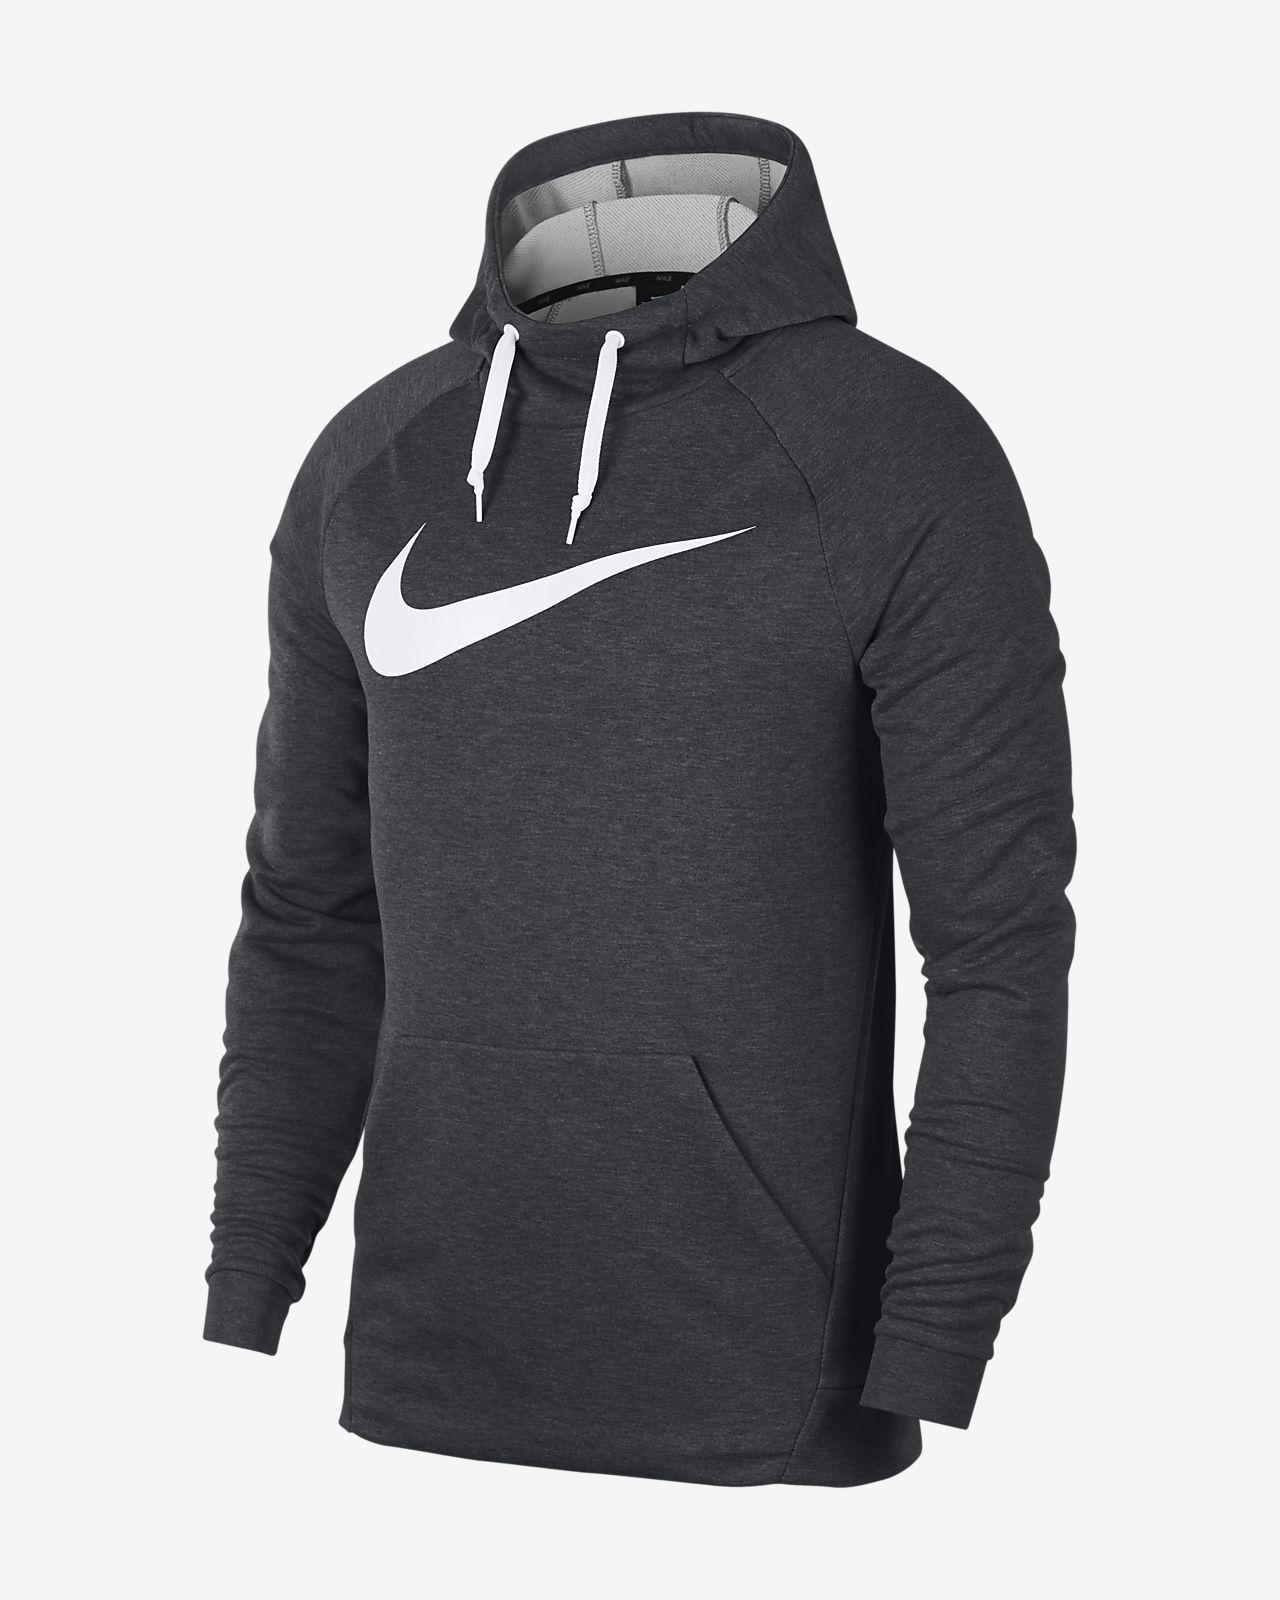 Hood Jacket Nike S Black Running Dri